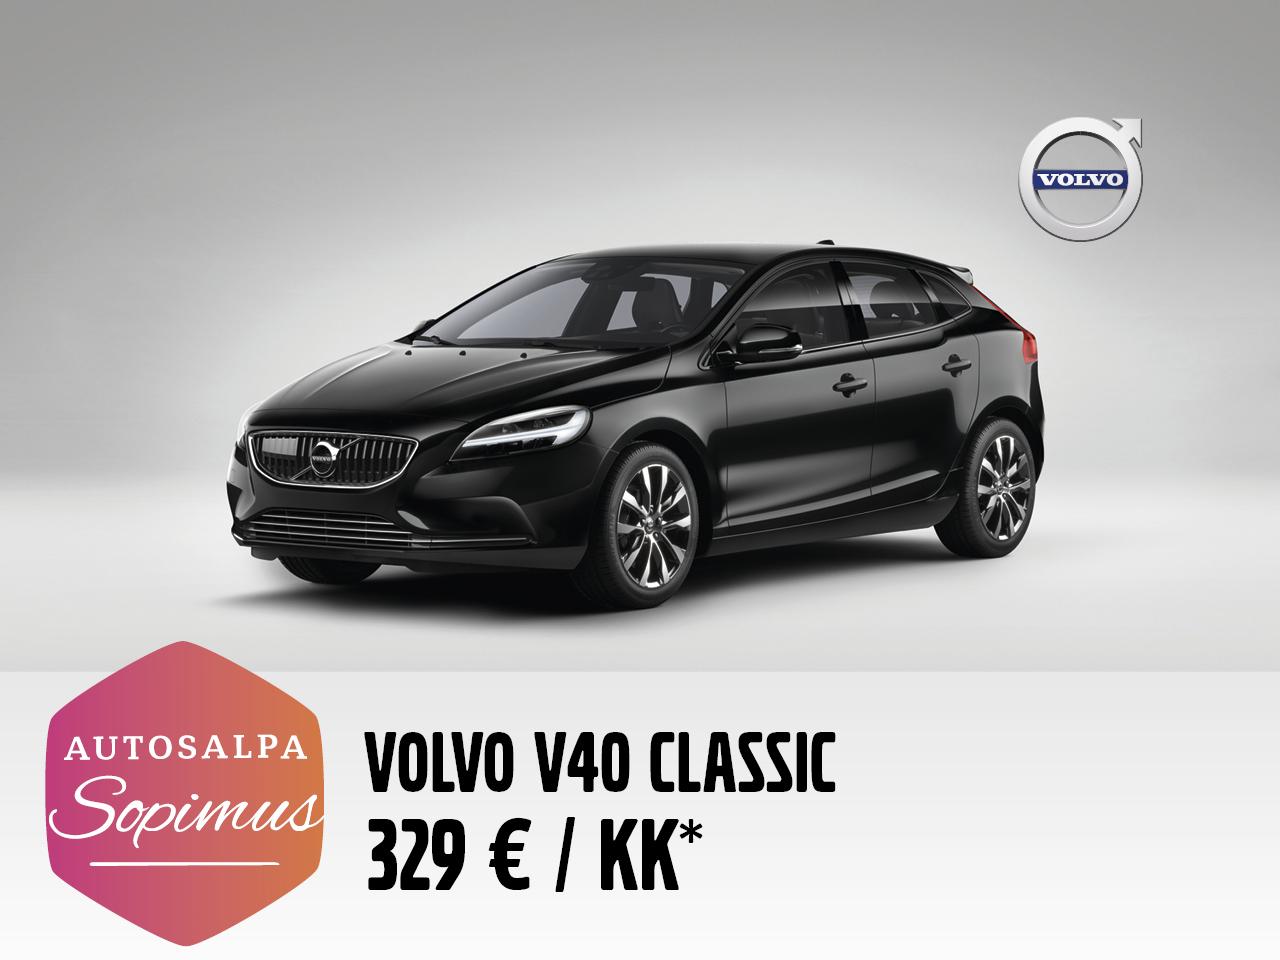 Volvo V40 Classic 329 € / kk